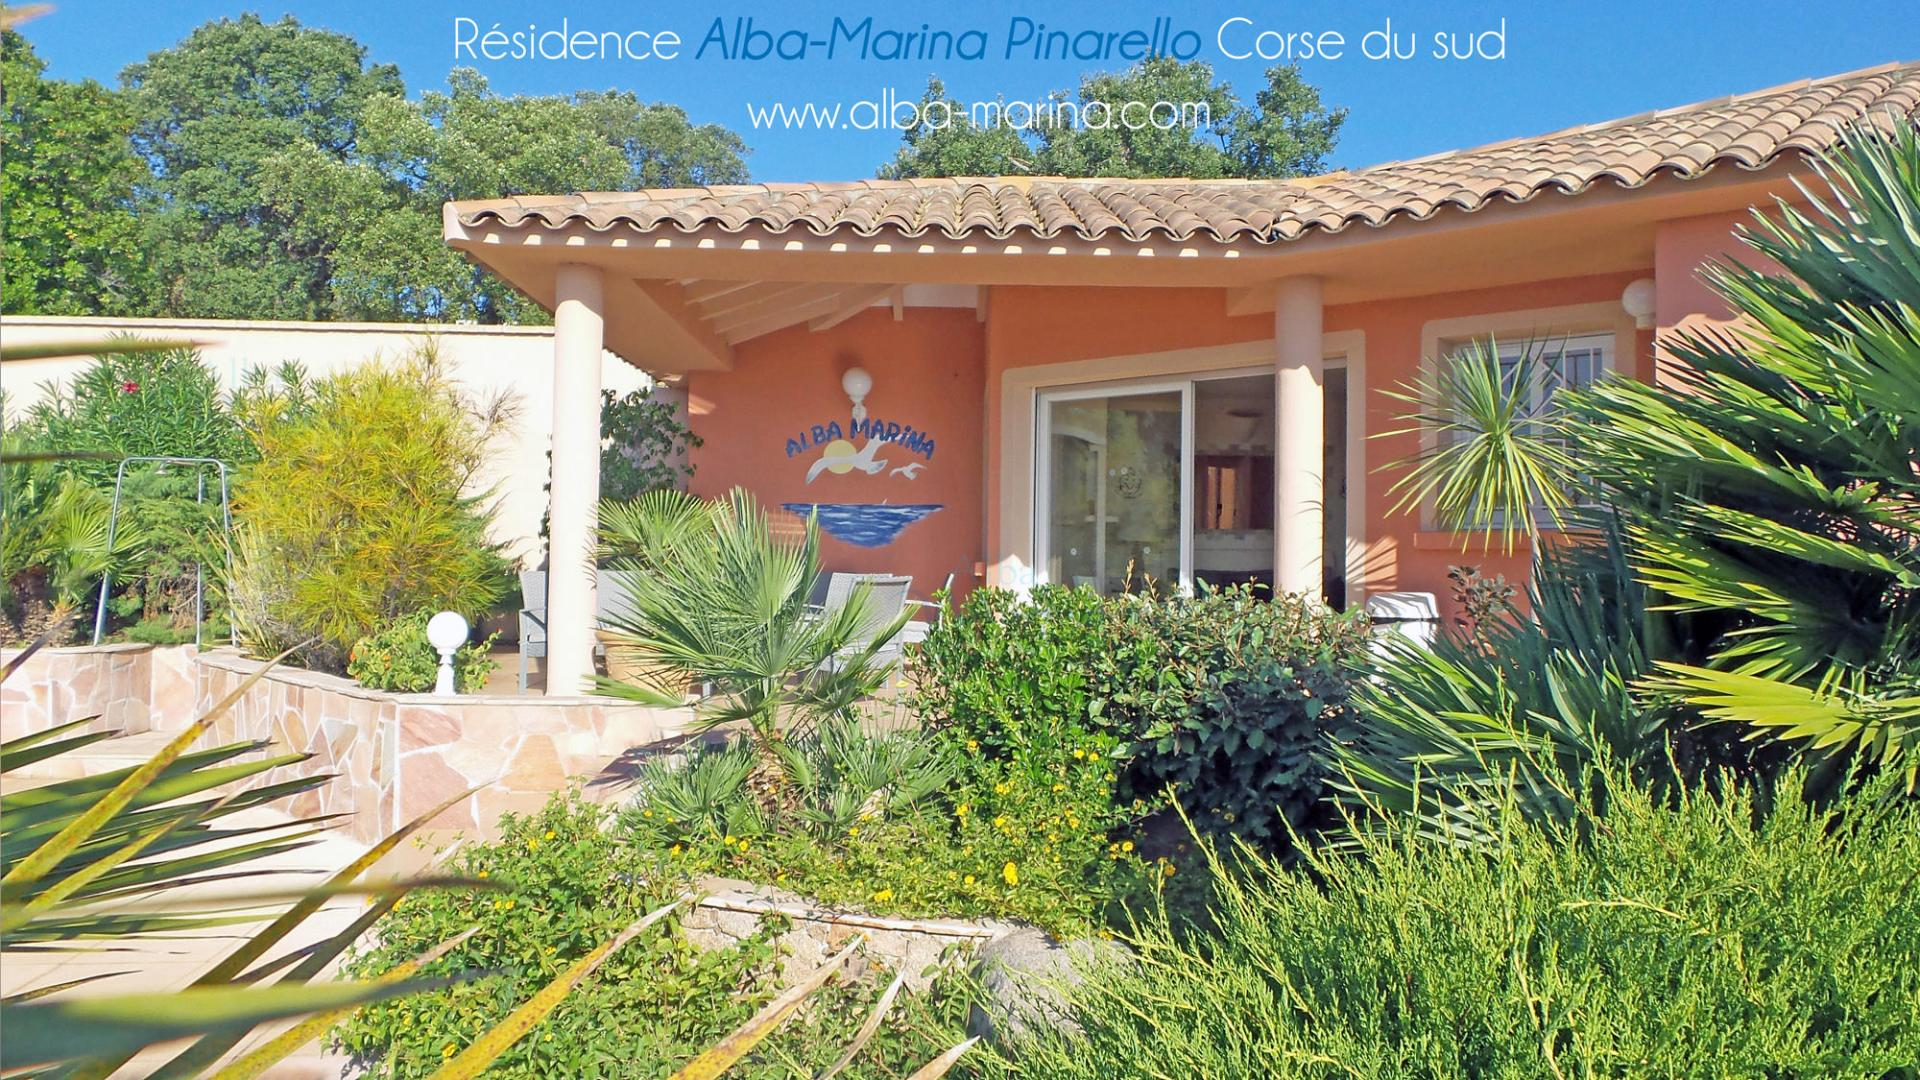 Séjour en Corse location vacances Pinarellu